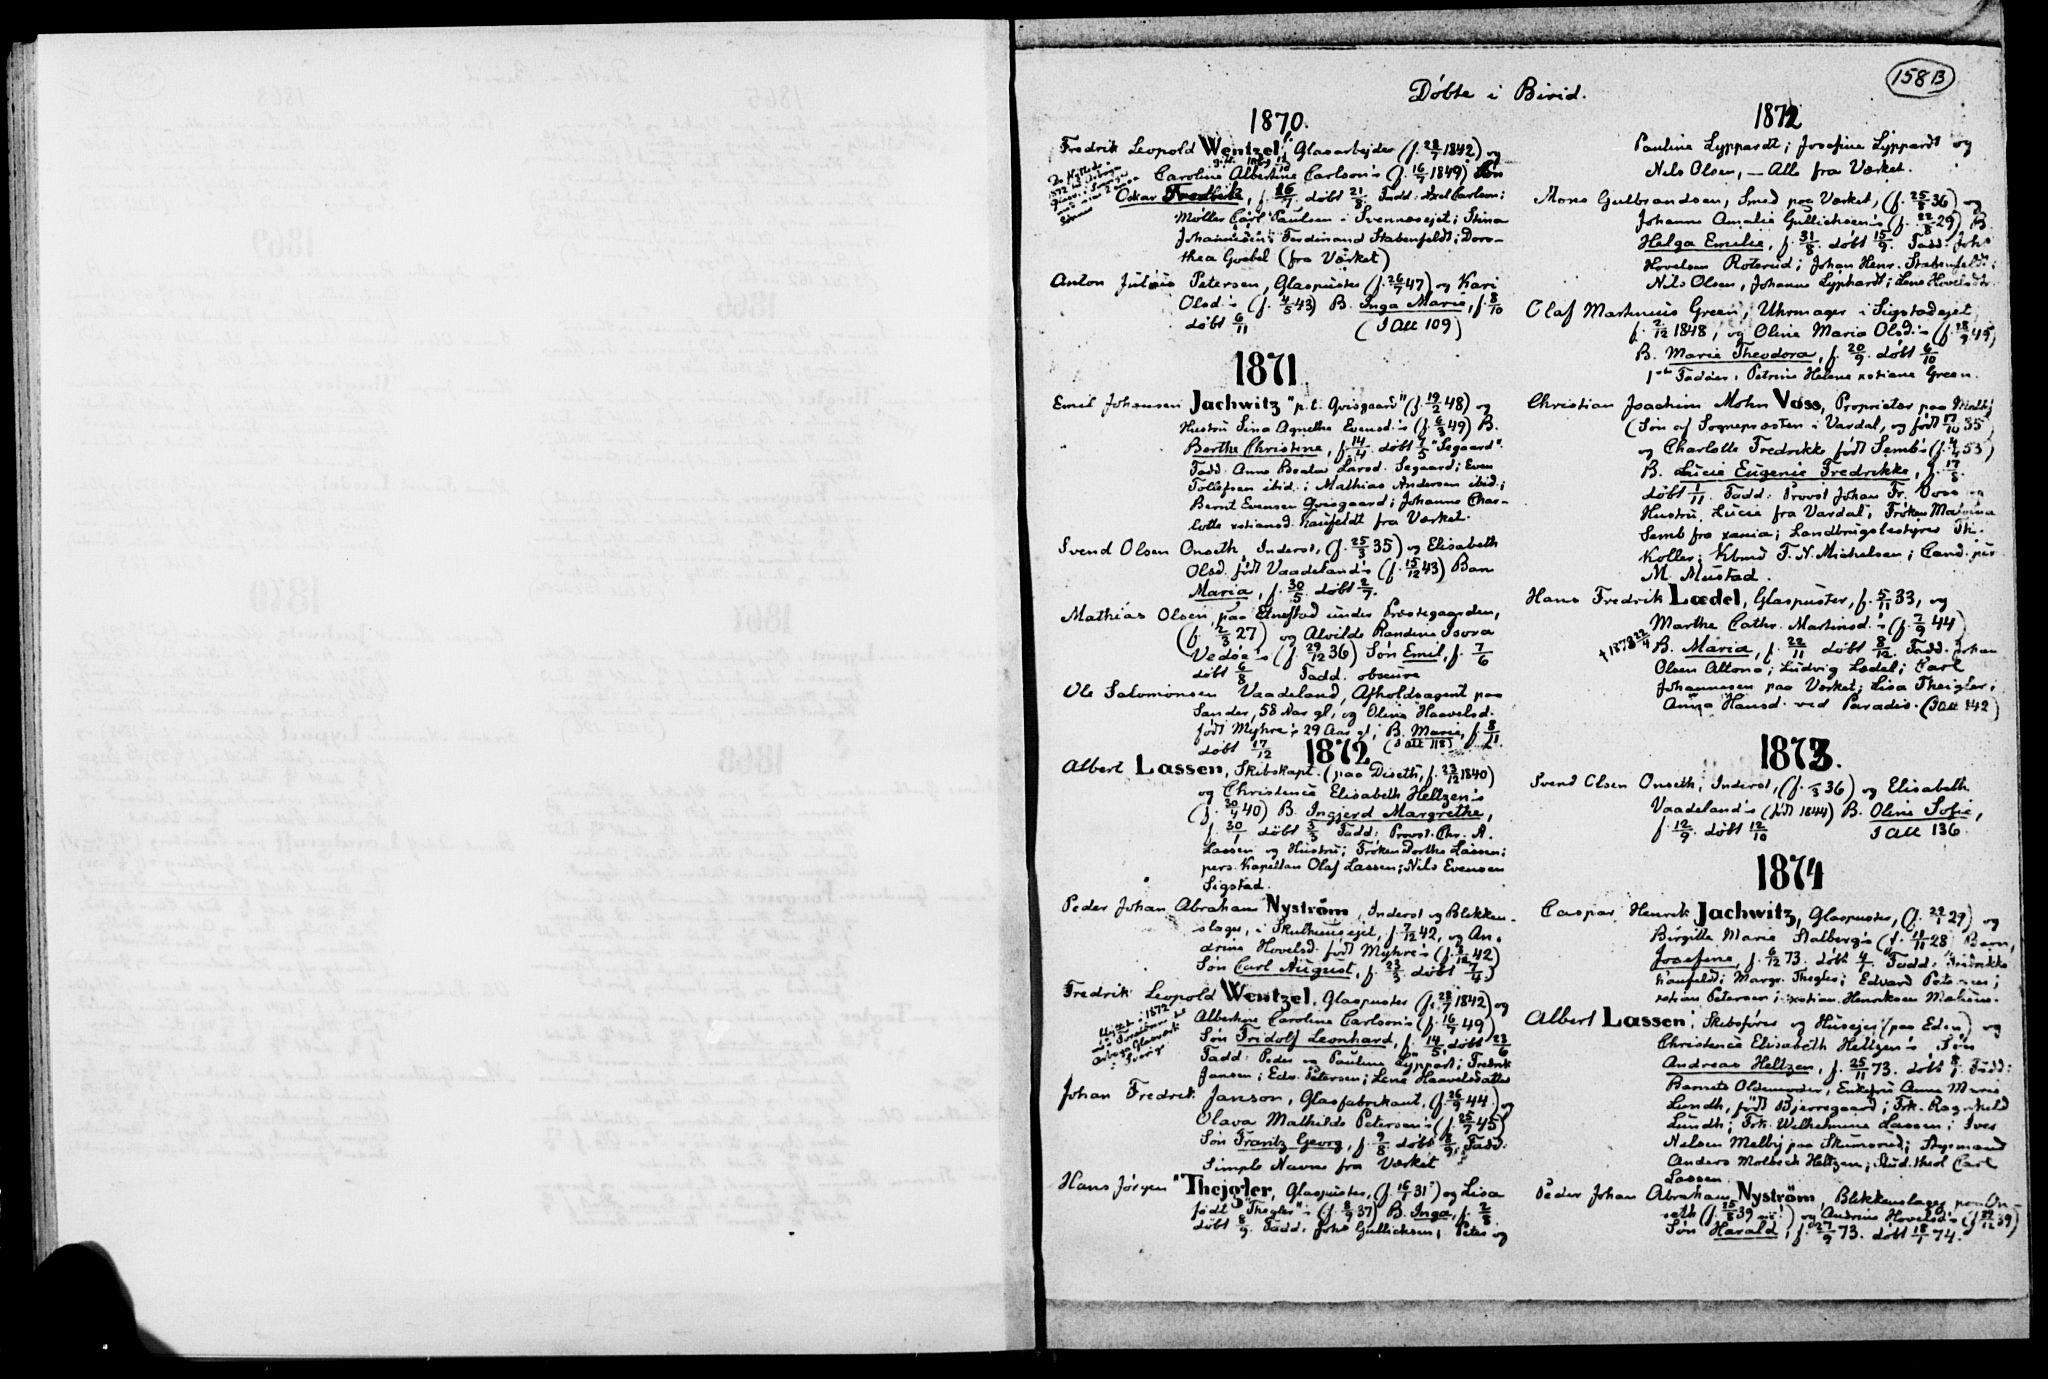 SAH, Biri prestekontor, Ministerialbok, 1730-1879, s. 158b